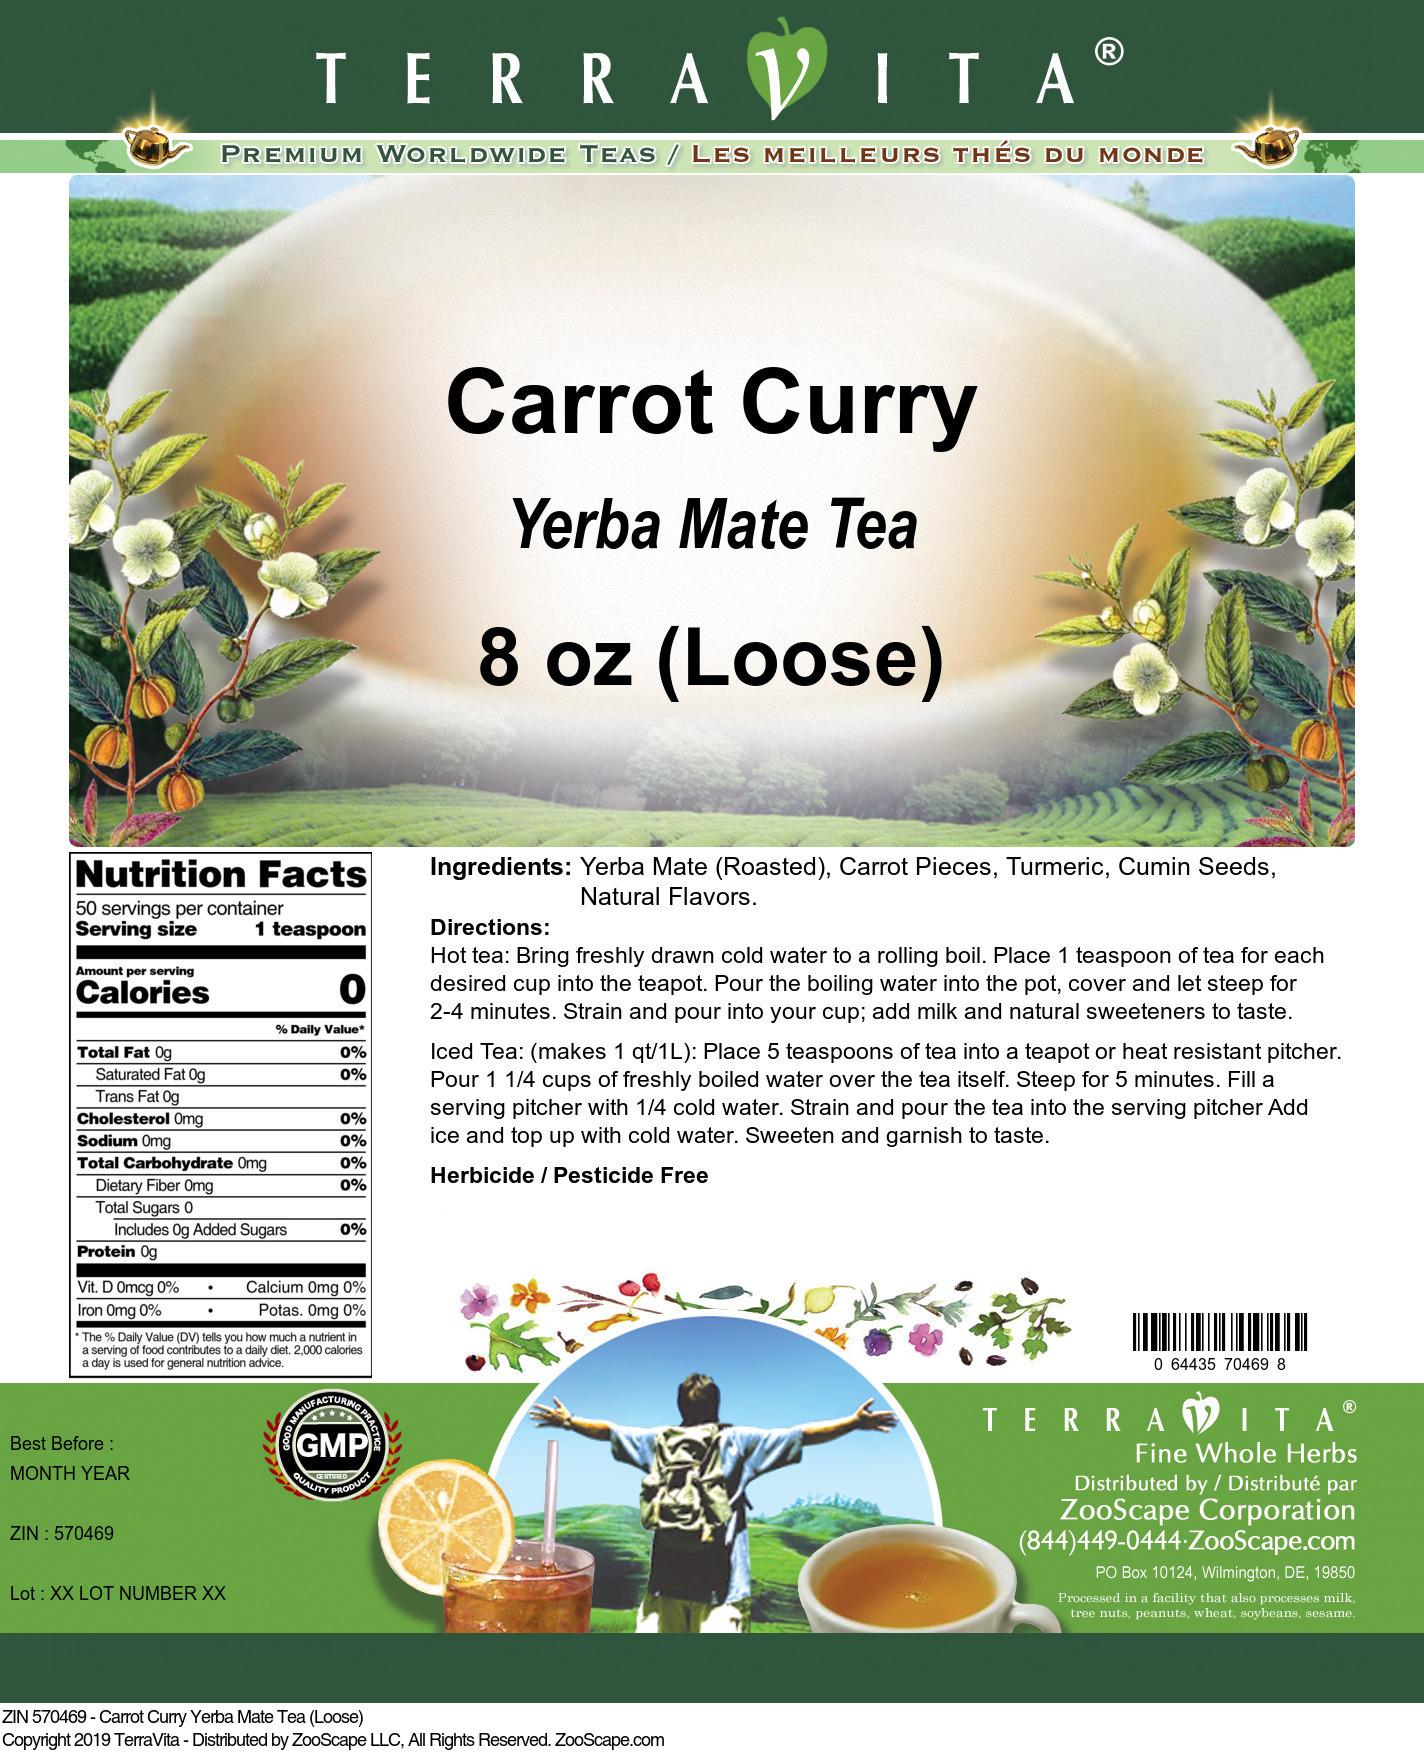 Carrot Curry Yerba Mate Tea (Loose)